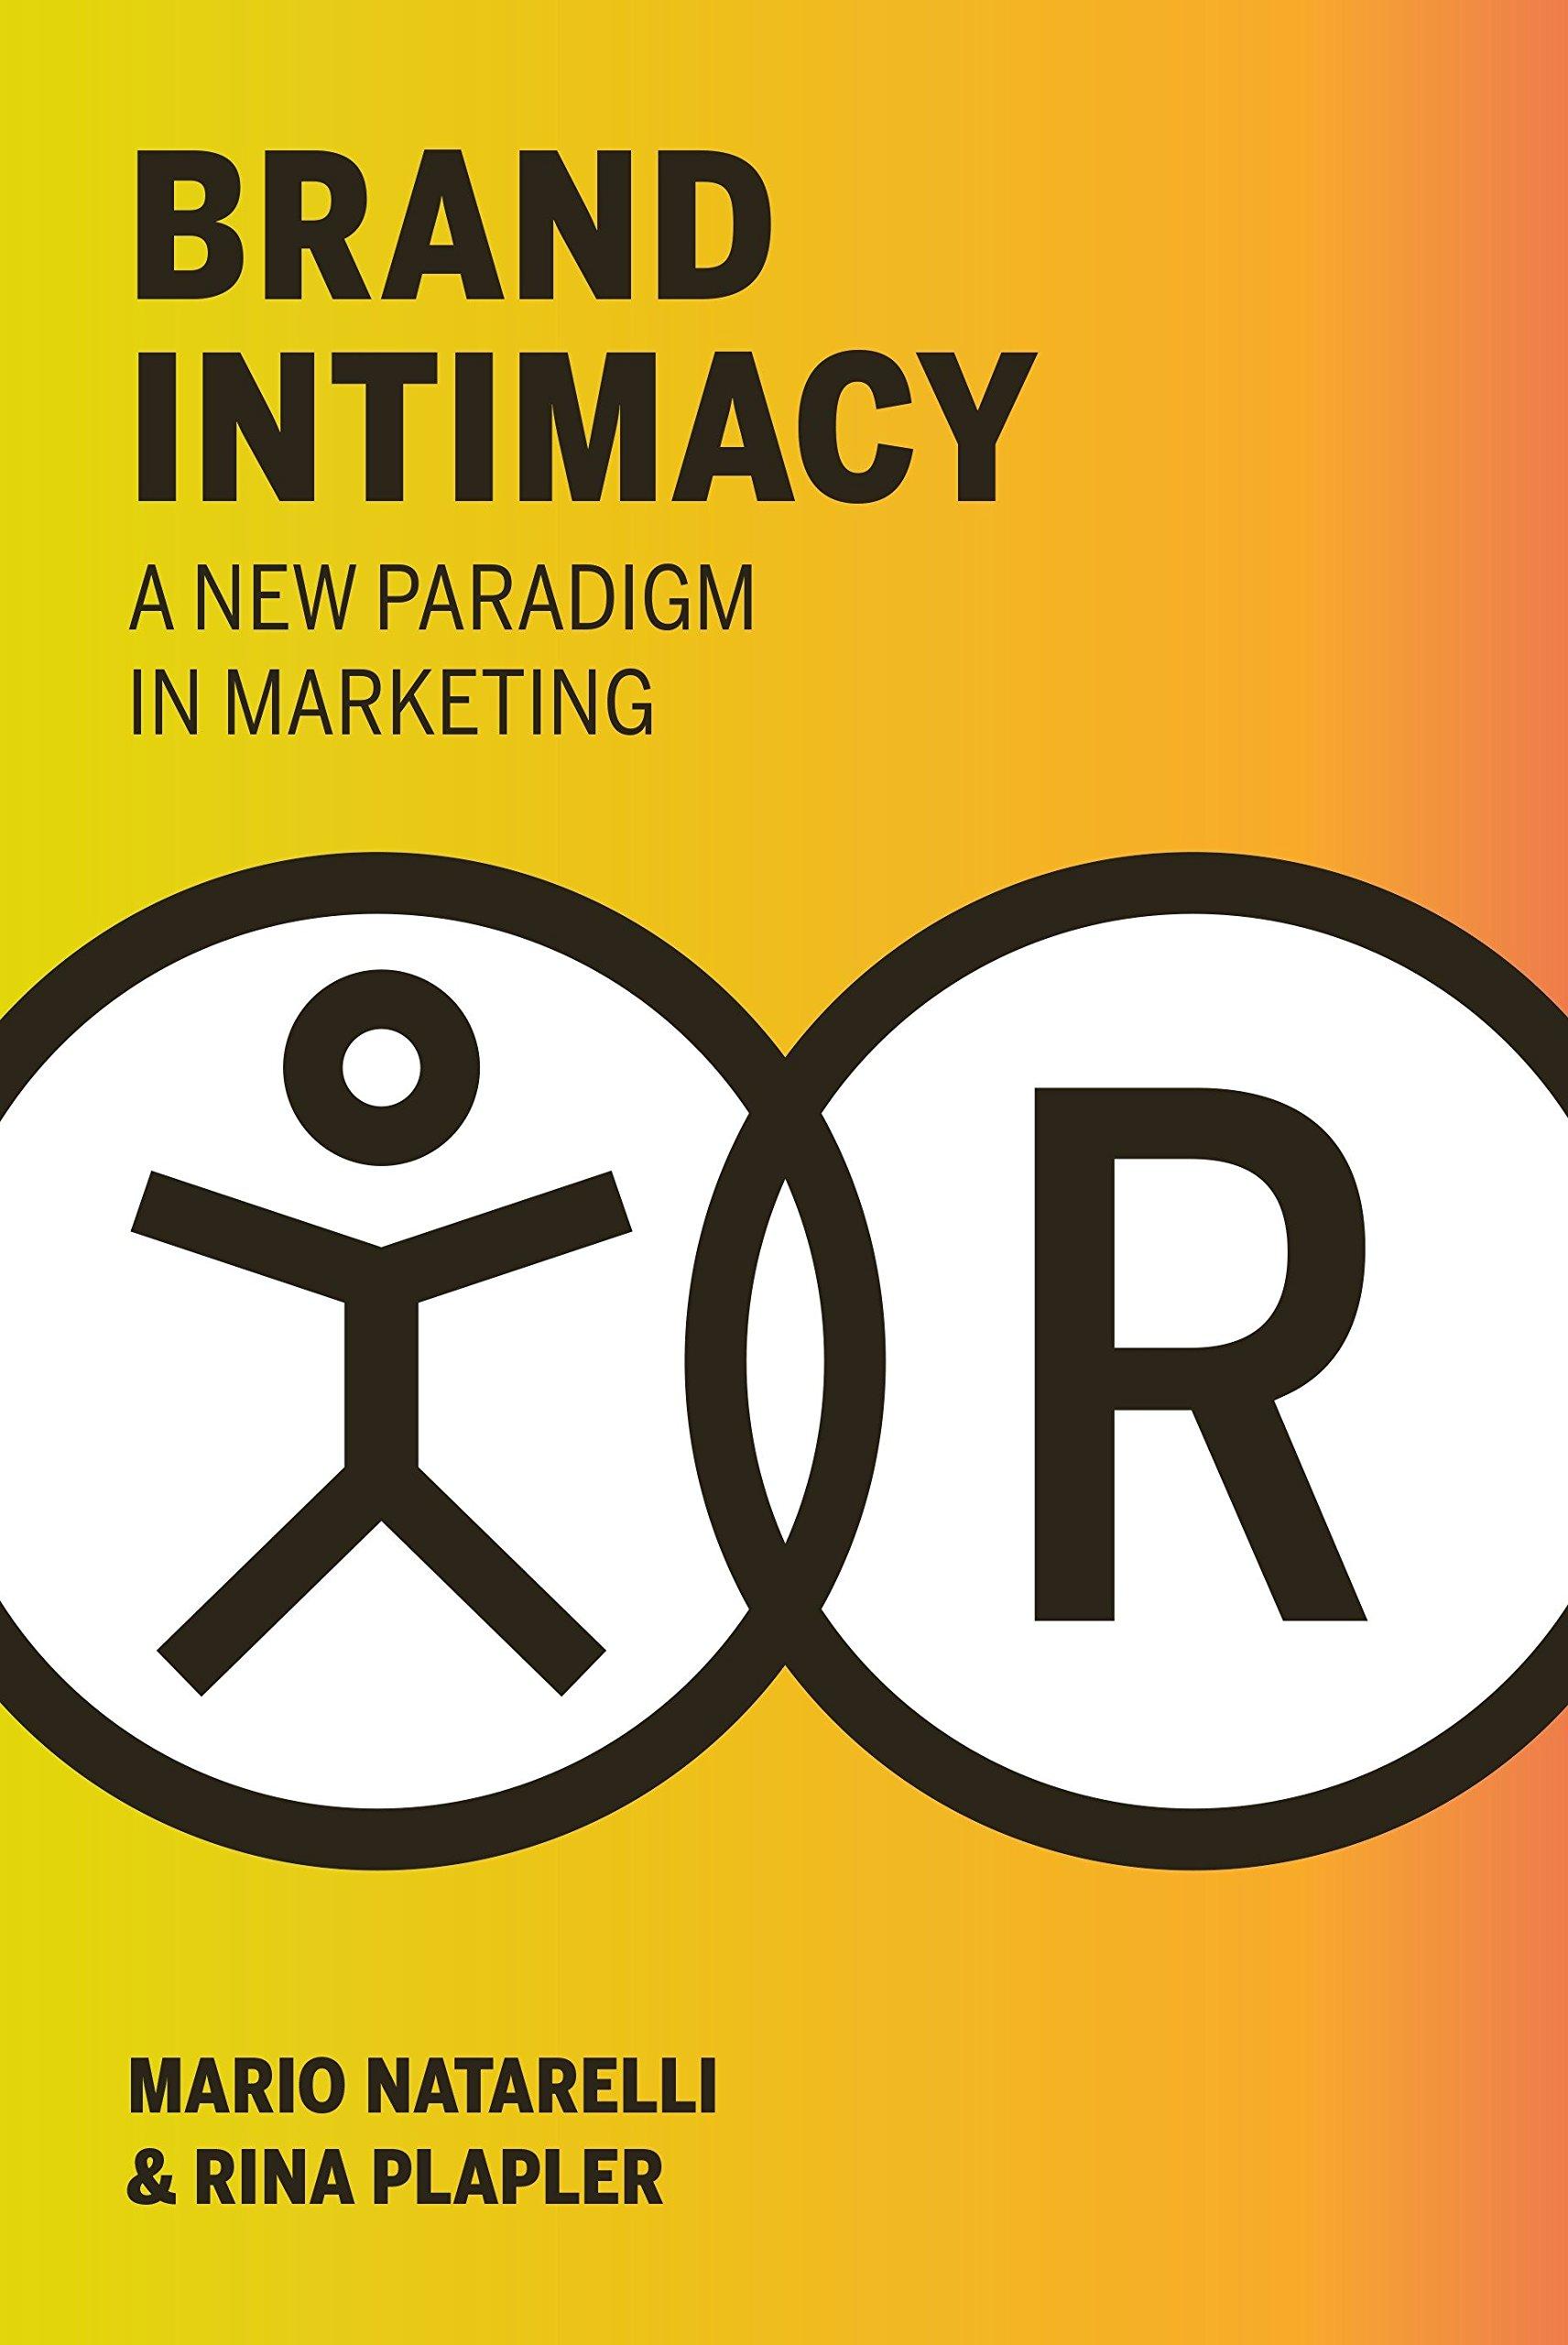 Brand Intimacy: A New Paradigm in Marketing